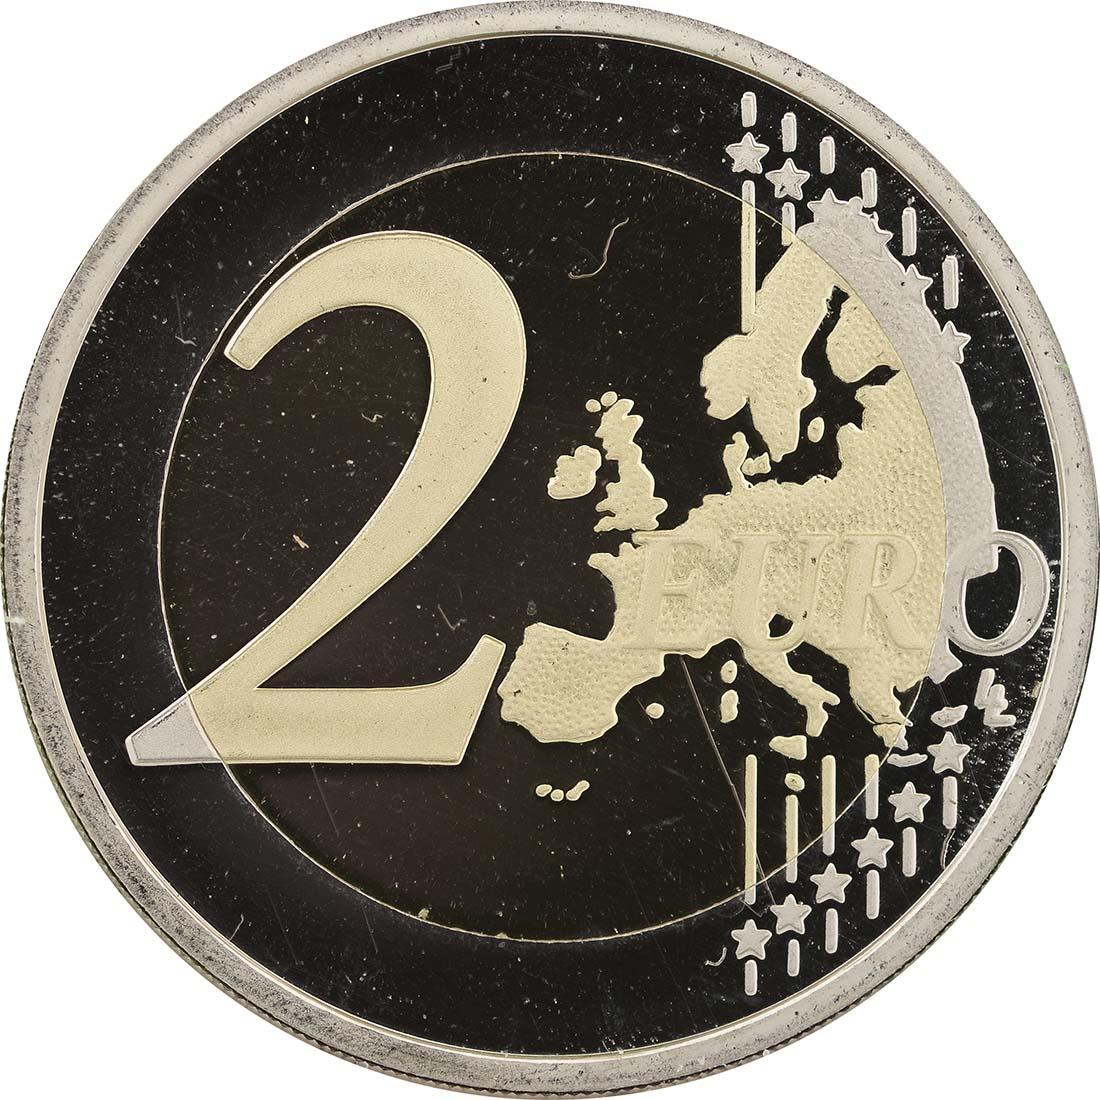 Bild der Vorderseite :Portugal - 2 Euro Europäische Kulturhauptstadt Guimaraes  2012 PP